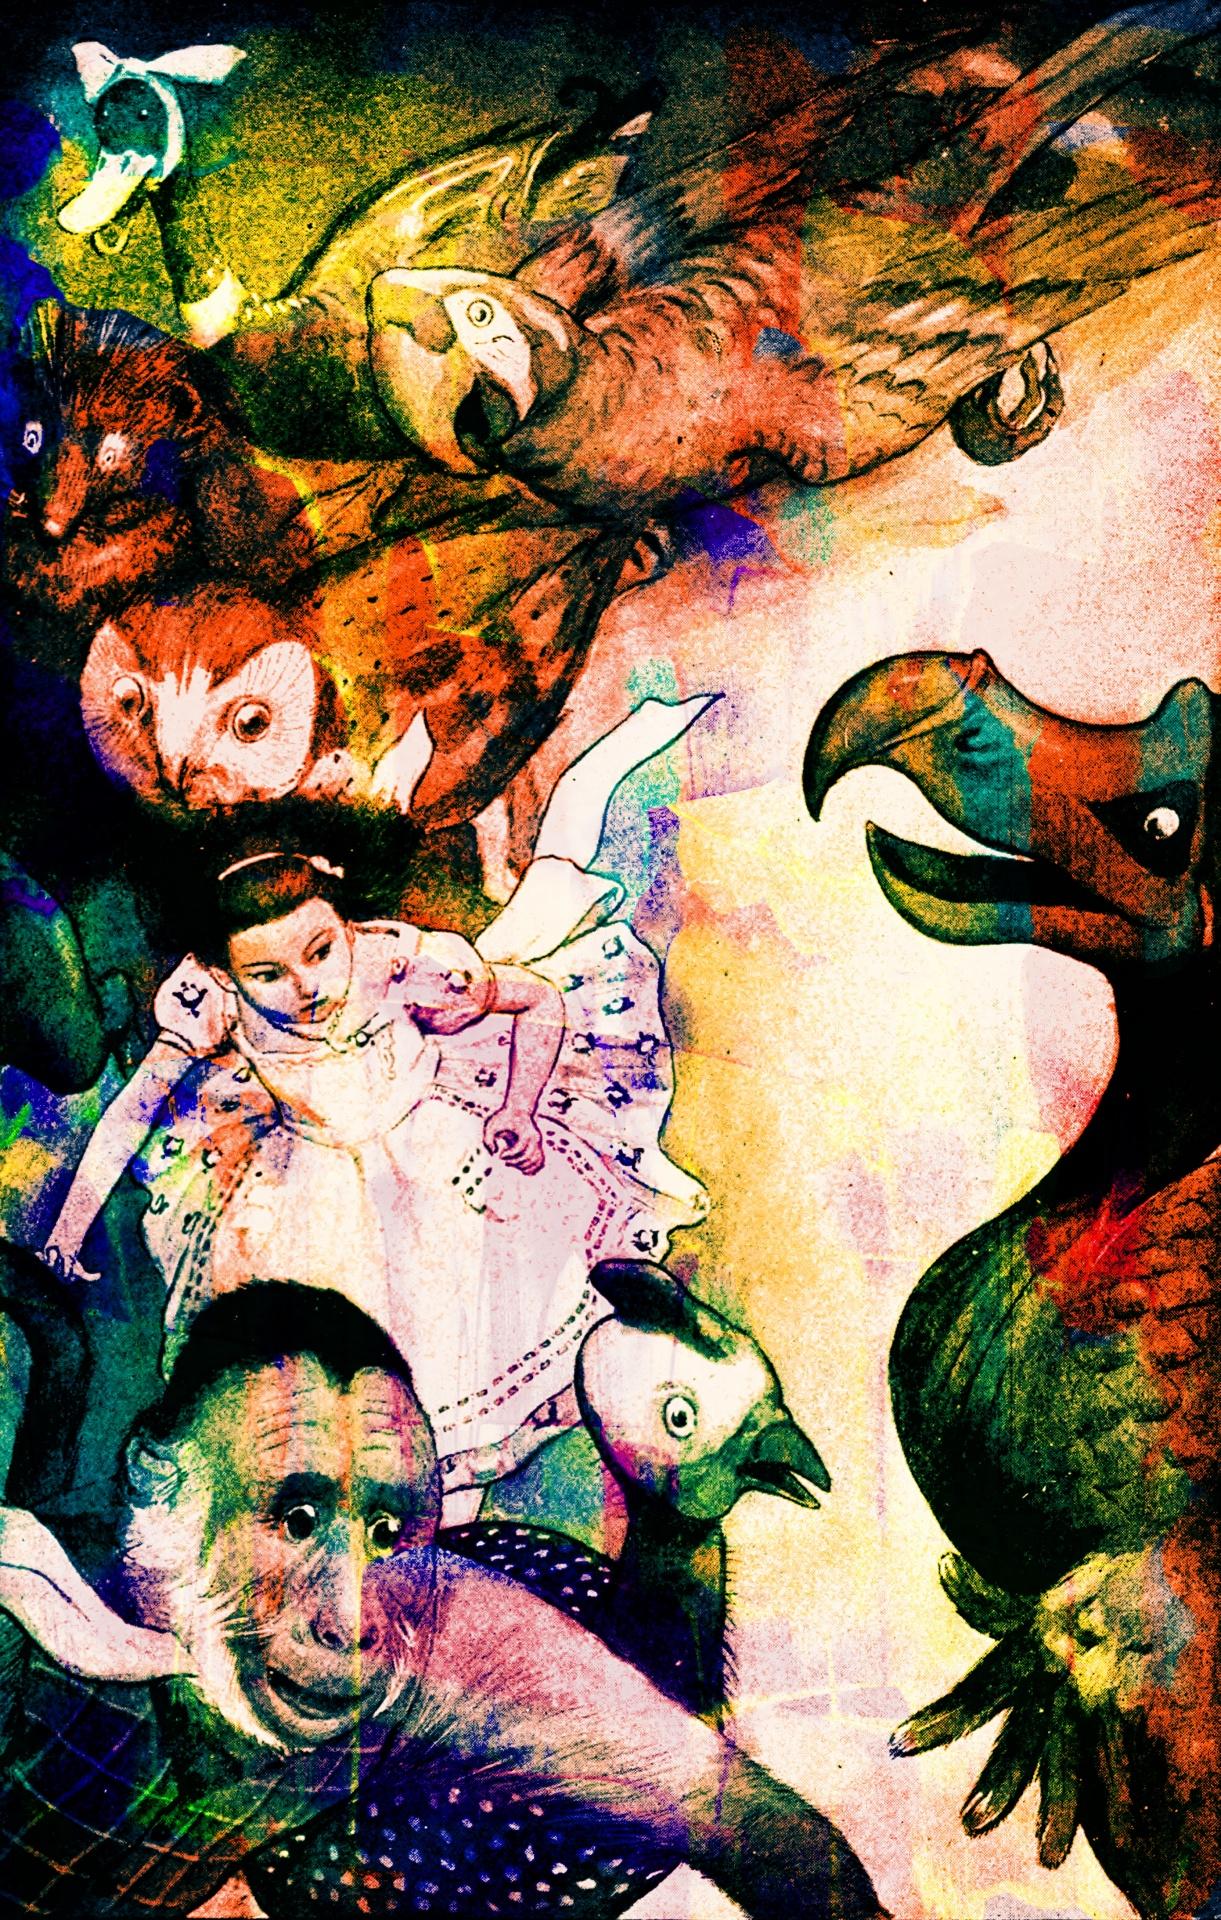 Vintagebook Illustrationalice Wonderlandold Fashionedvictorian